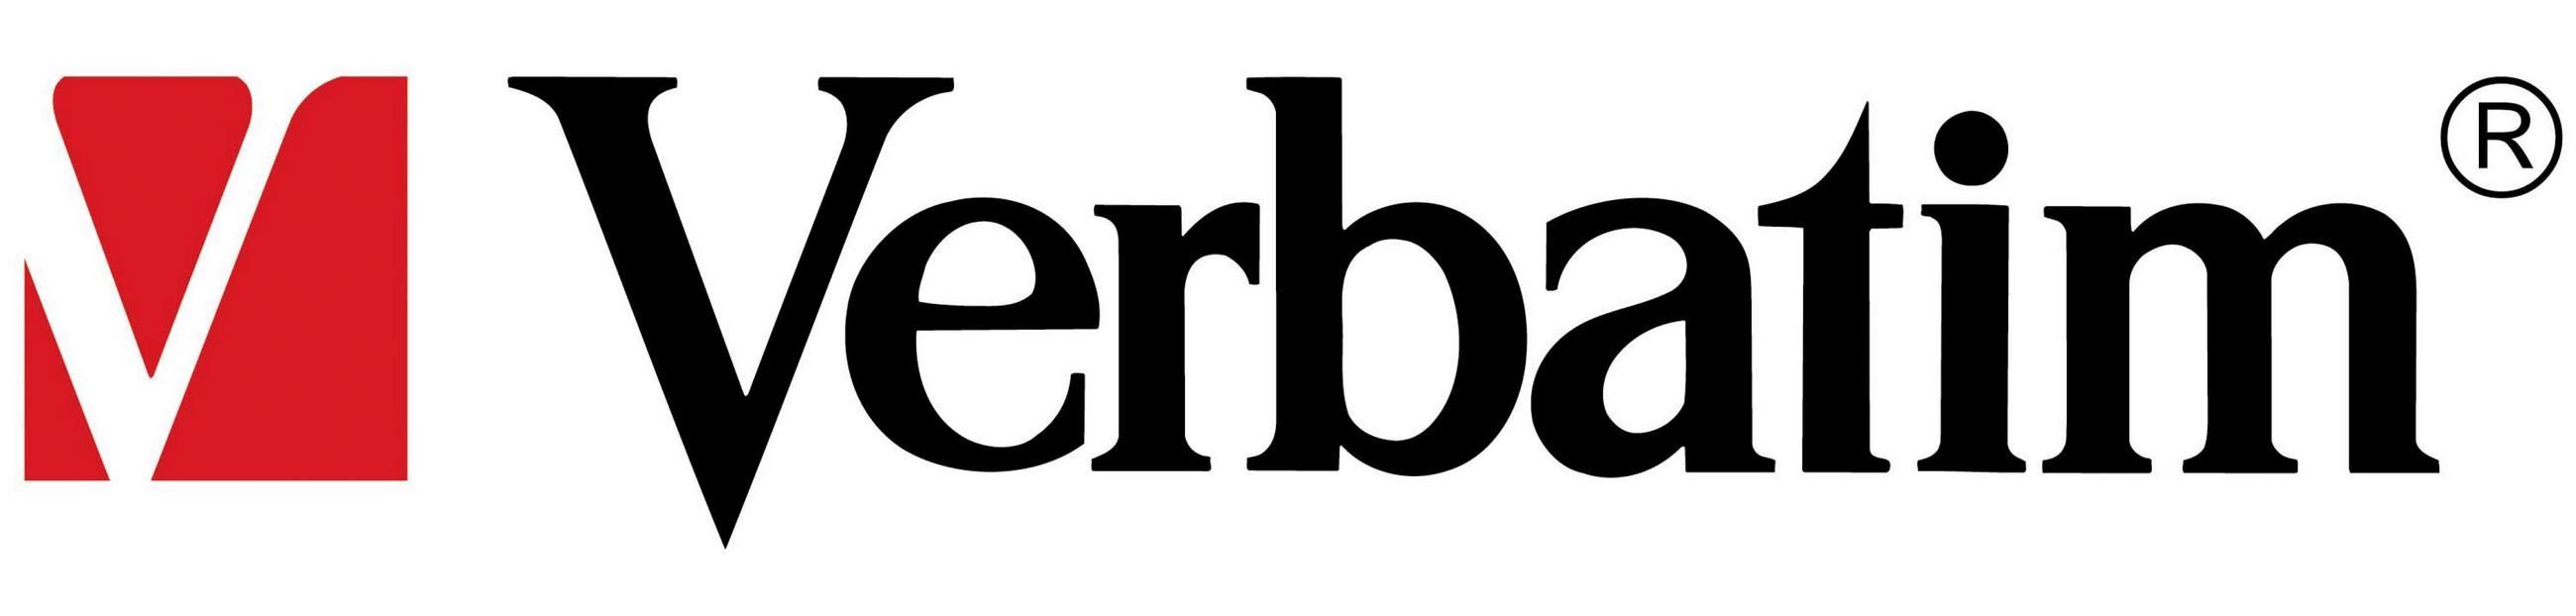 verbatim logo